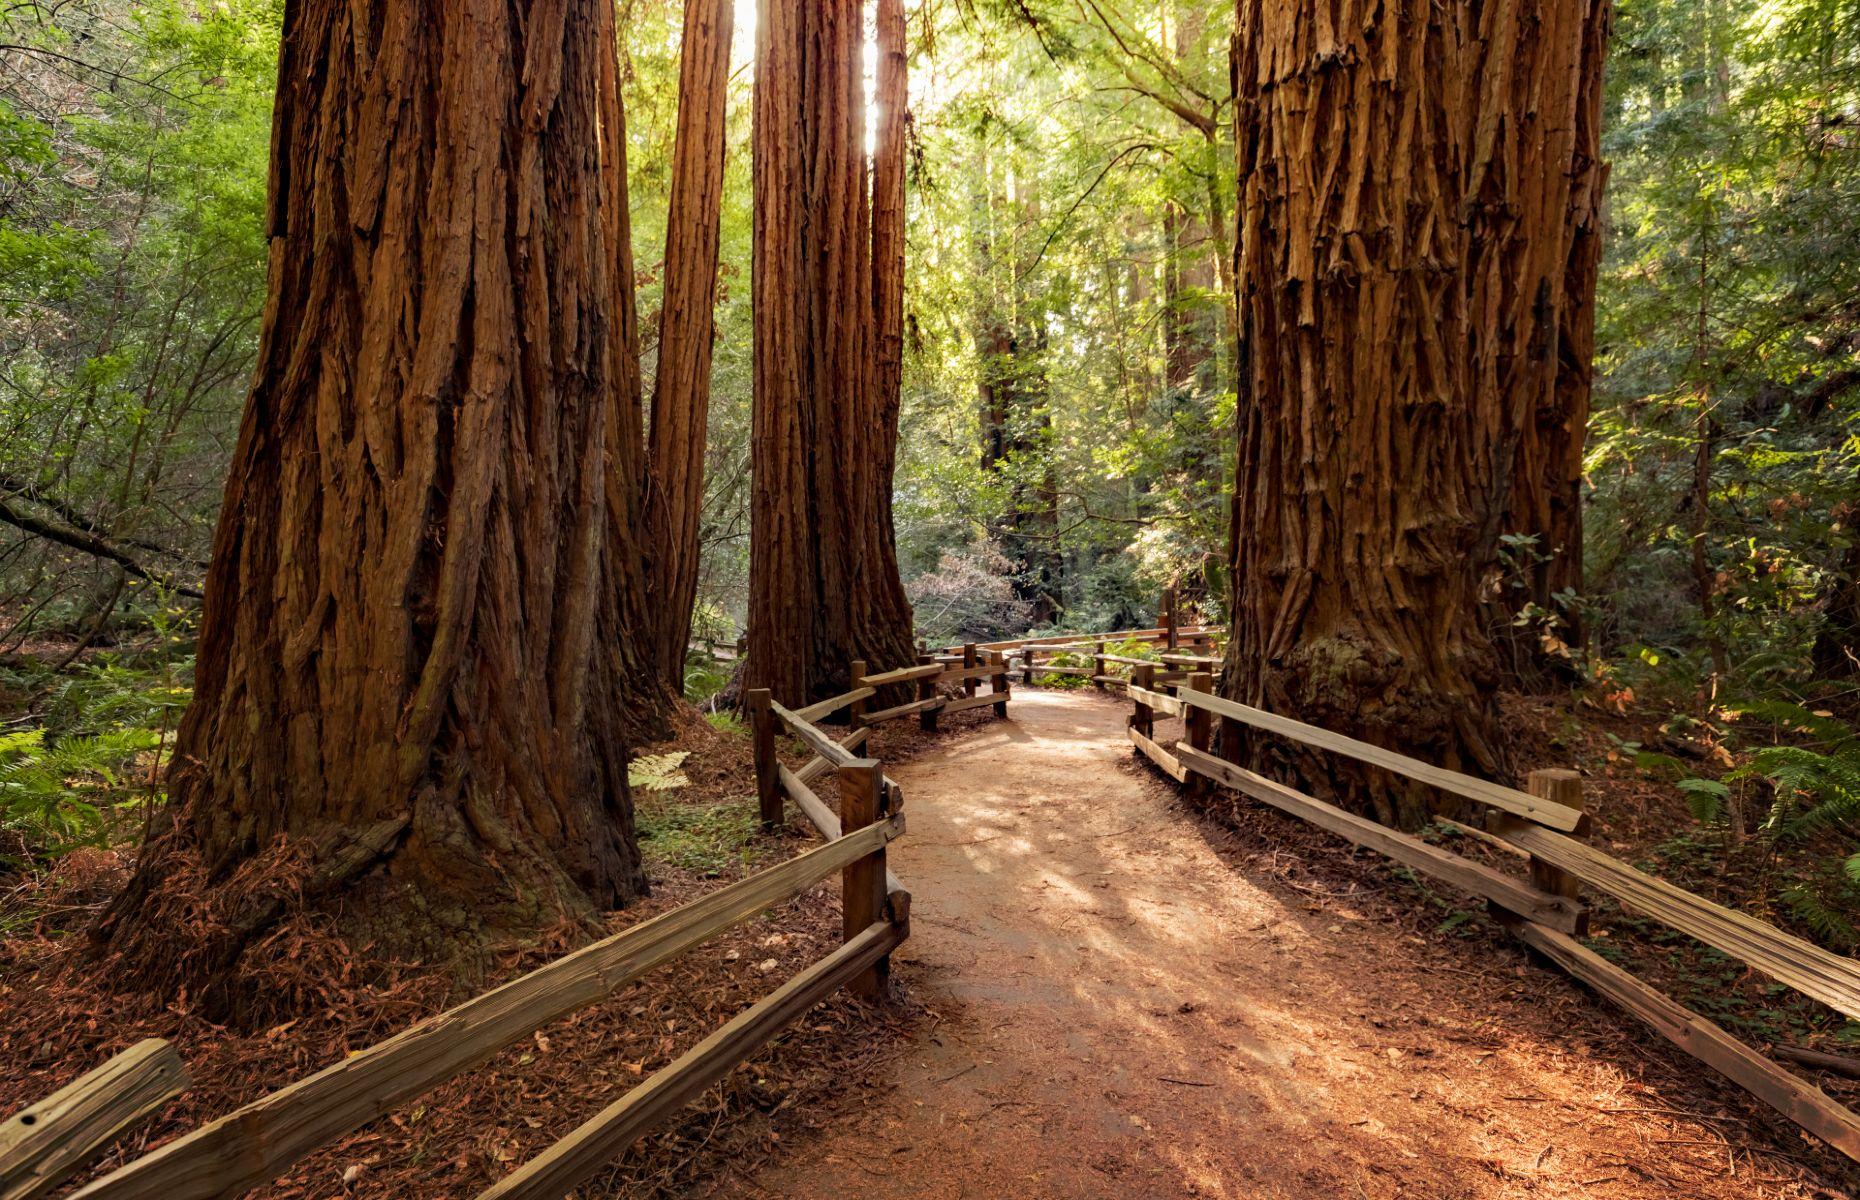 Muir Woods National Monument (Image: topseller/Shutterstock)